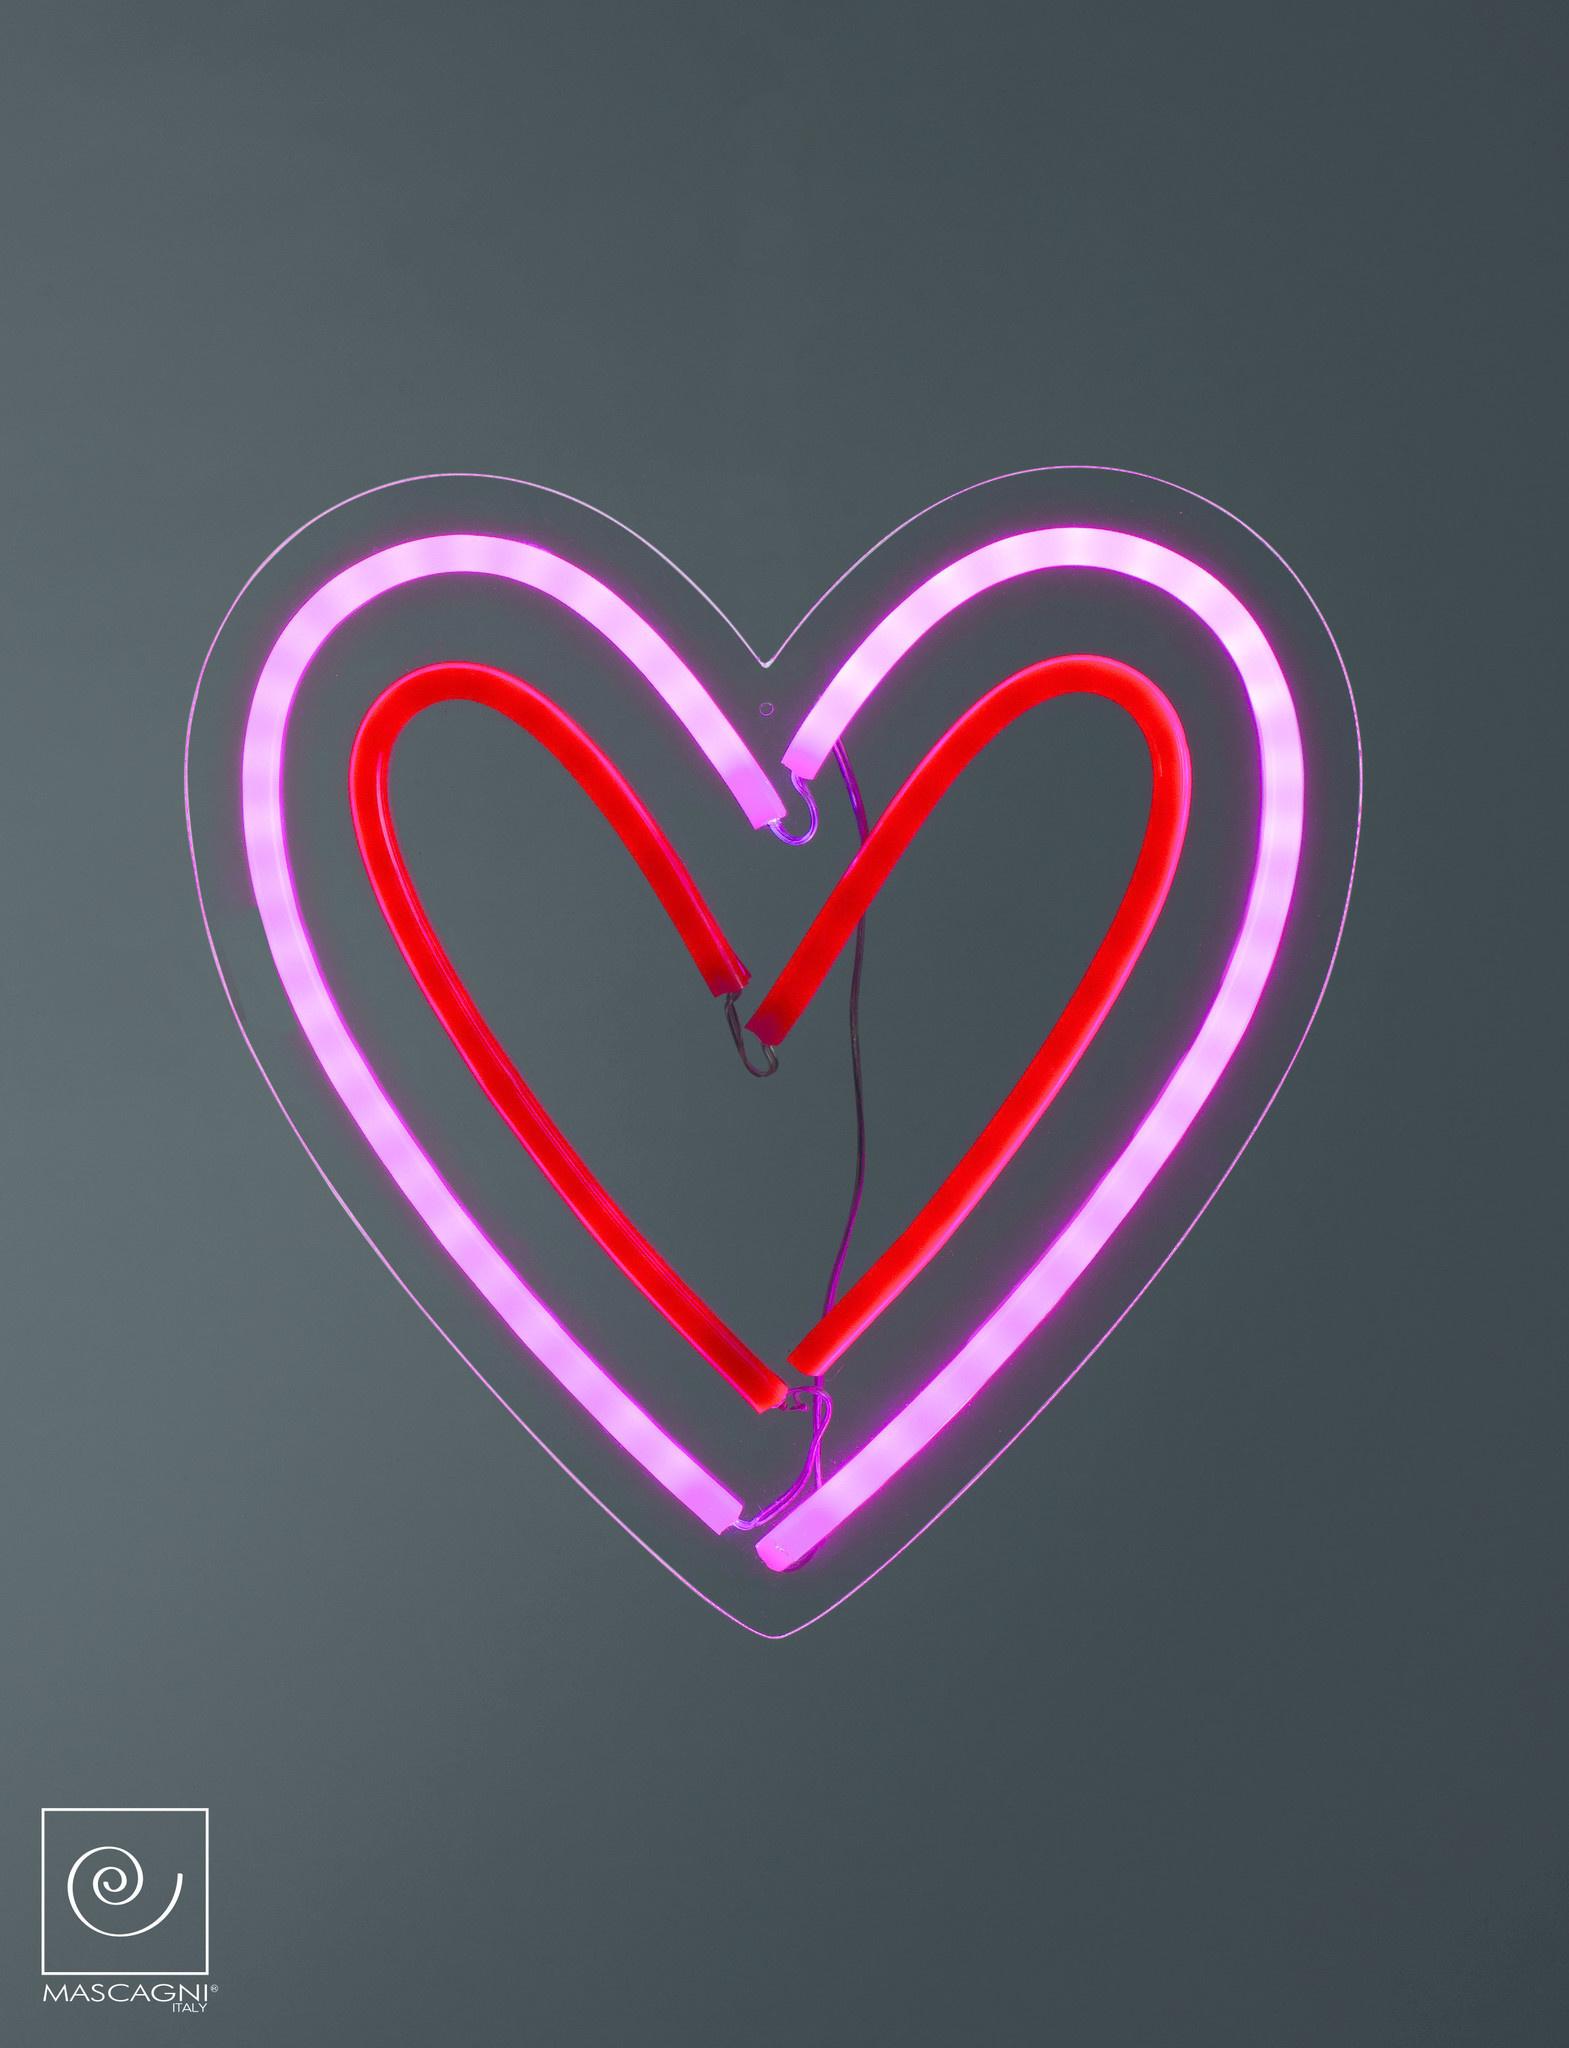 Art Mascagni HEART WALL LED DECORATION